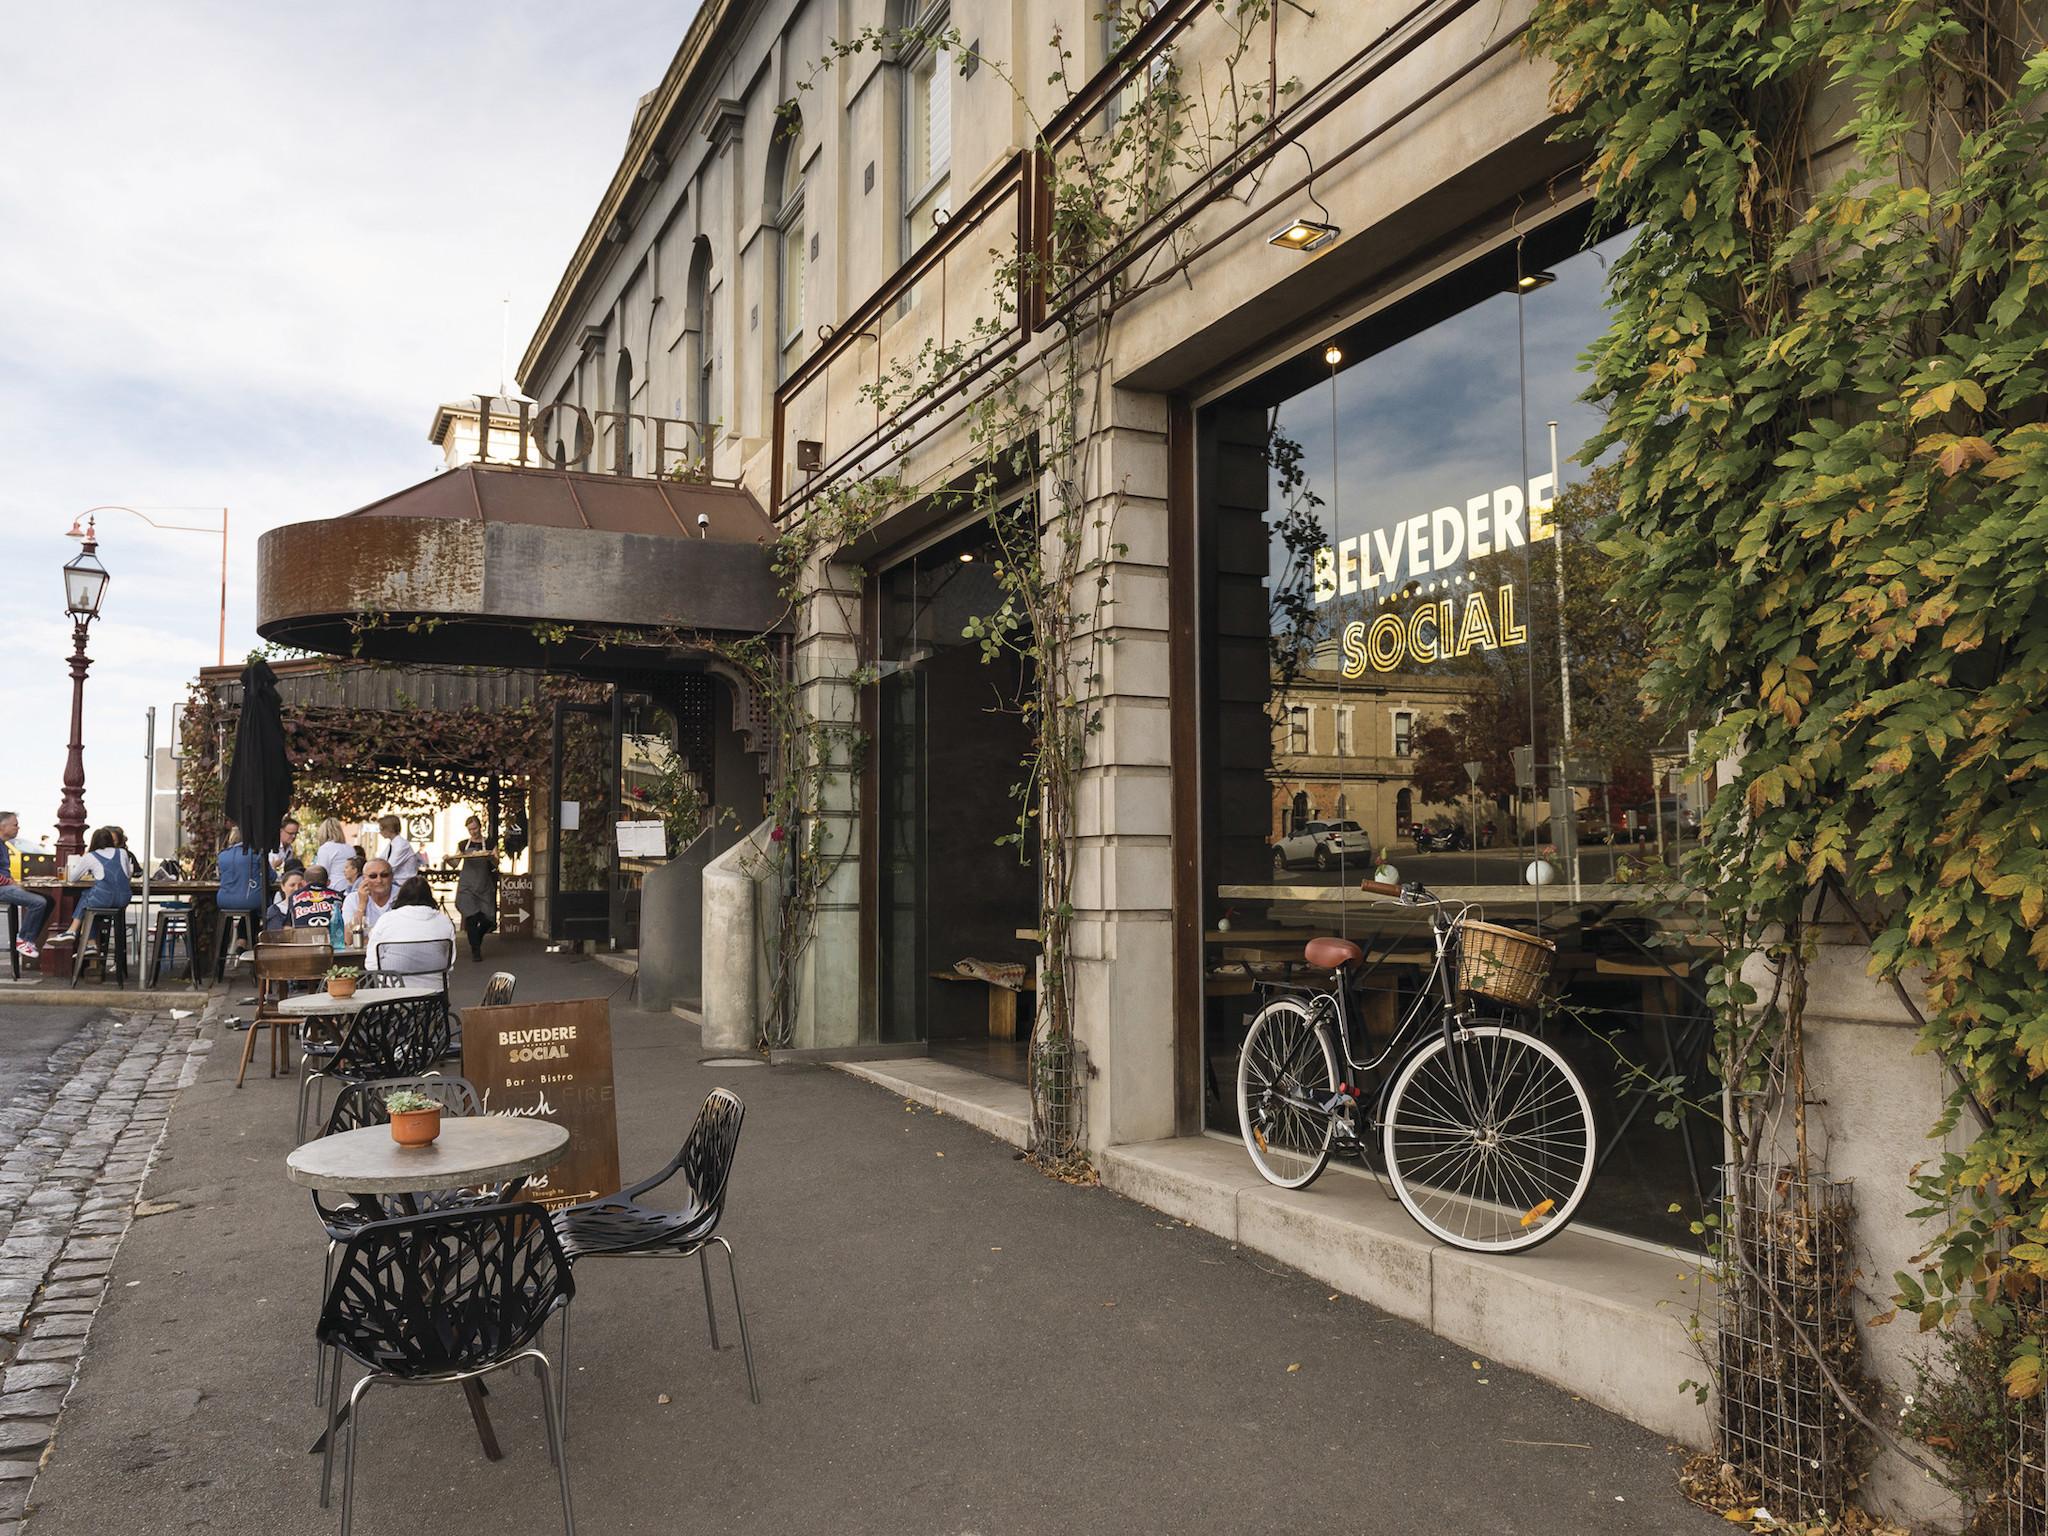 Belvedere Social, Daylesford